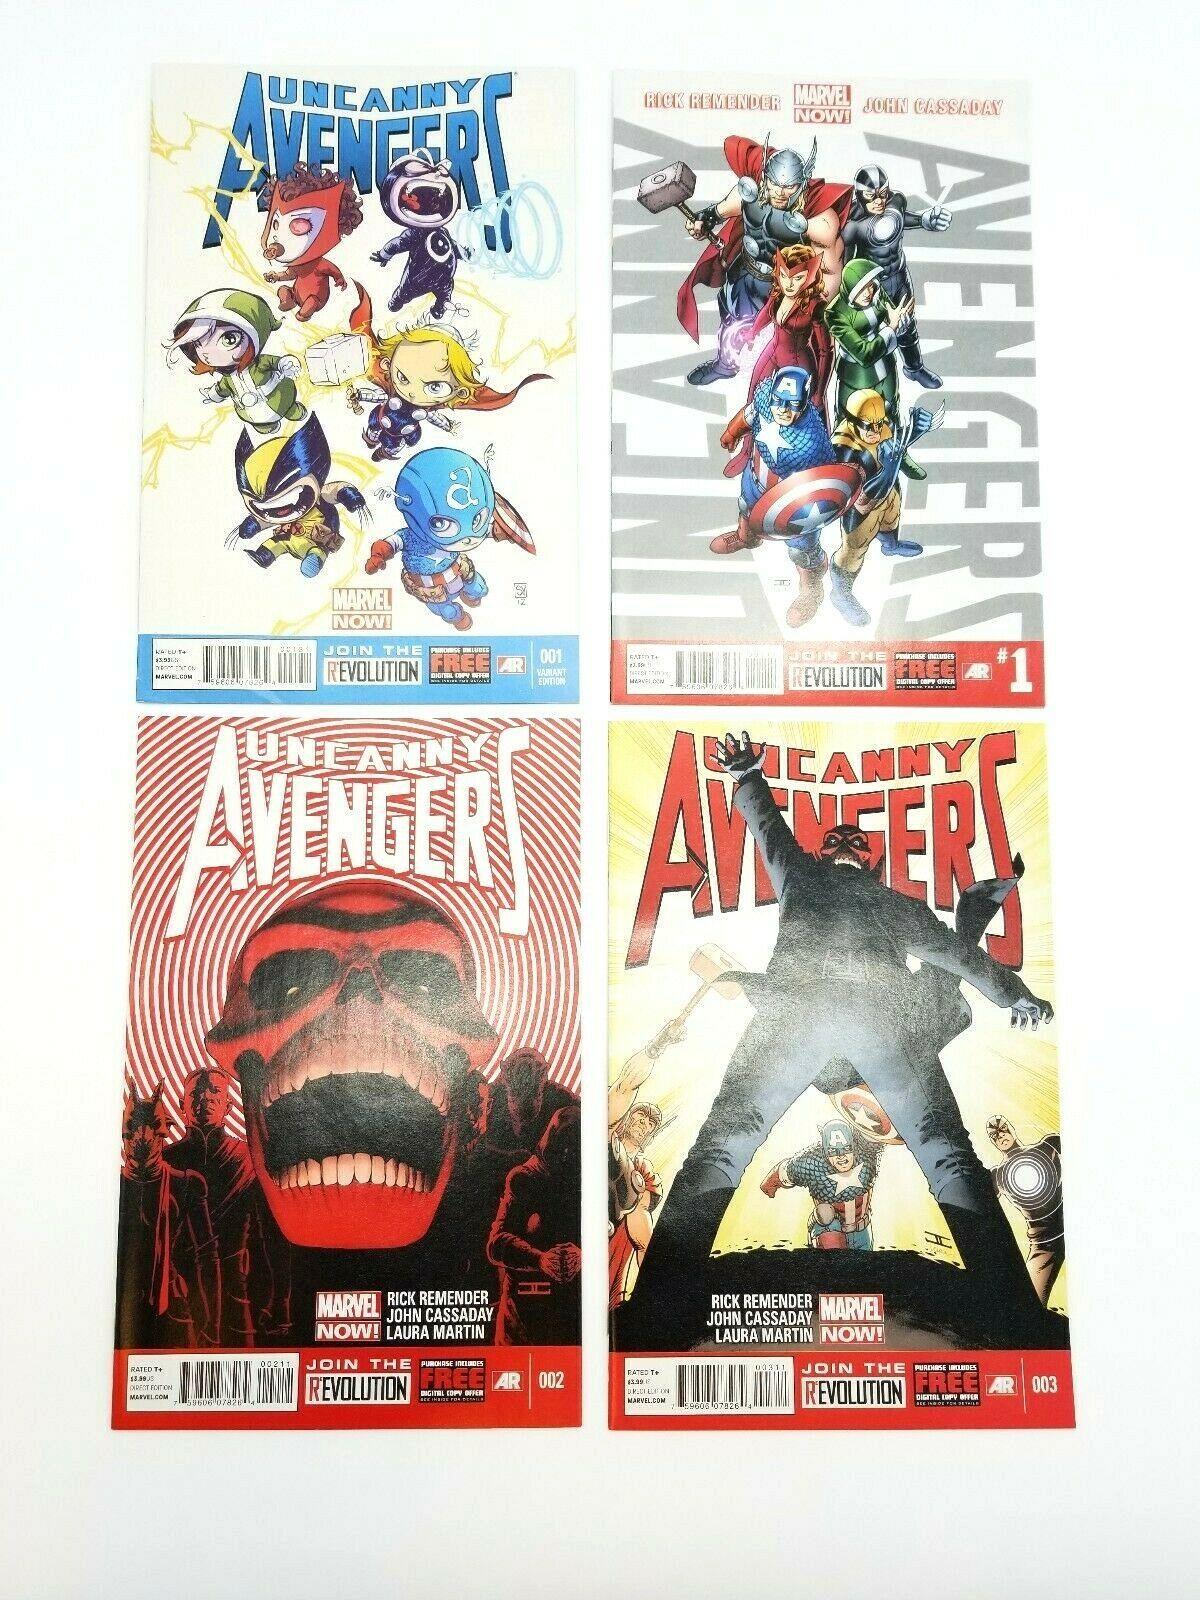 Uncanny Avengers 1-11 14-16 w/ Skottie Young Baby Variant Vol 1 2012 Comic Books image 2